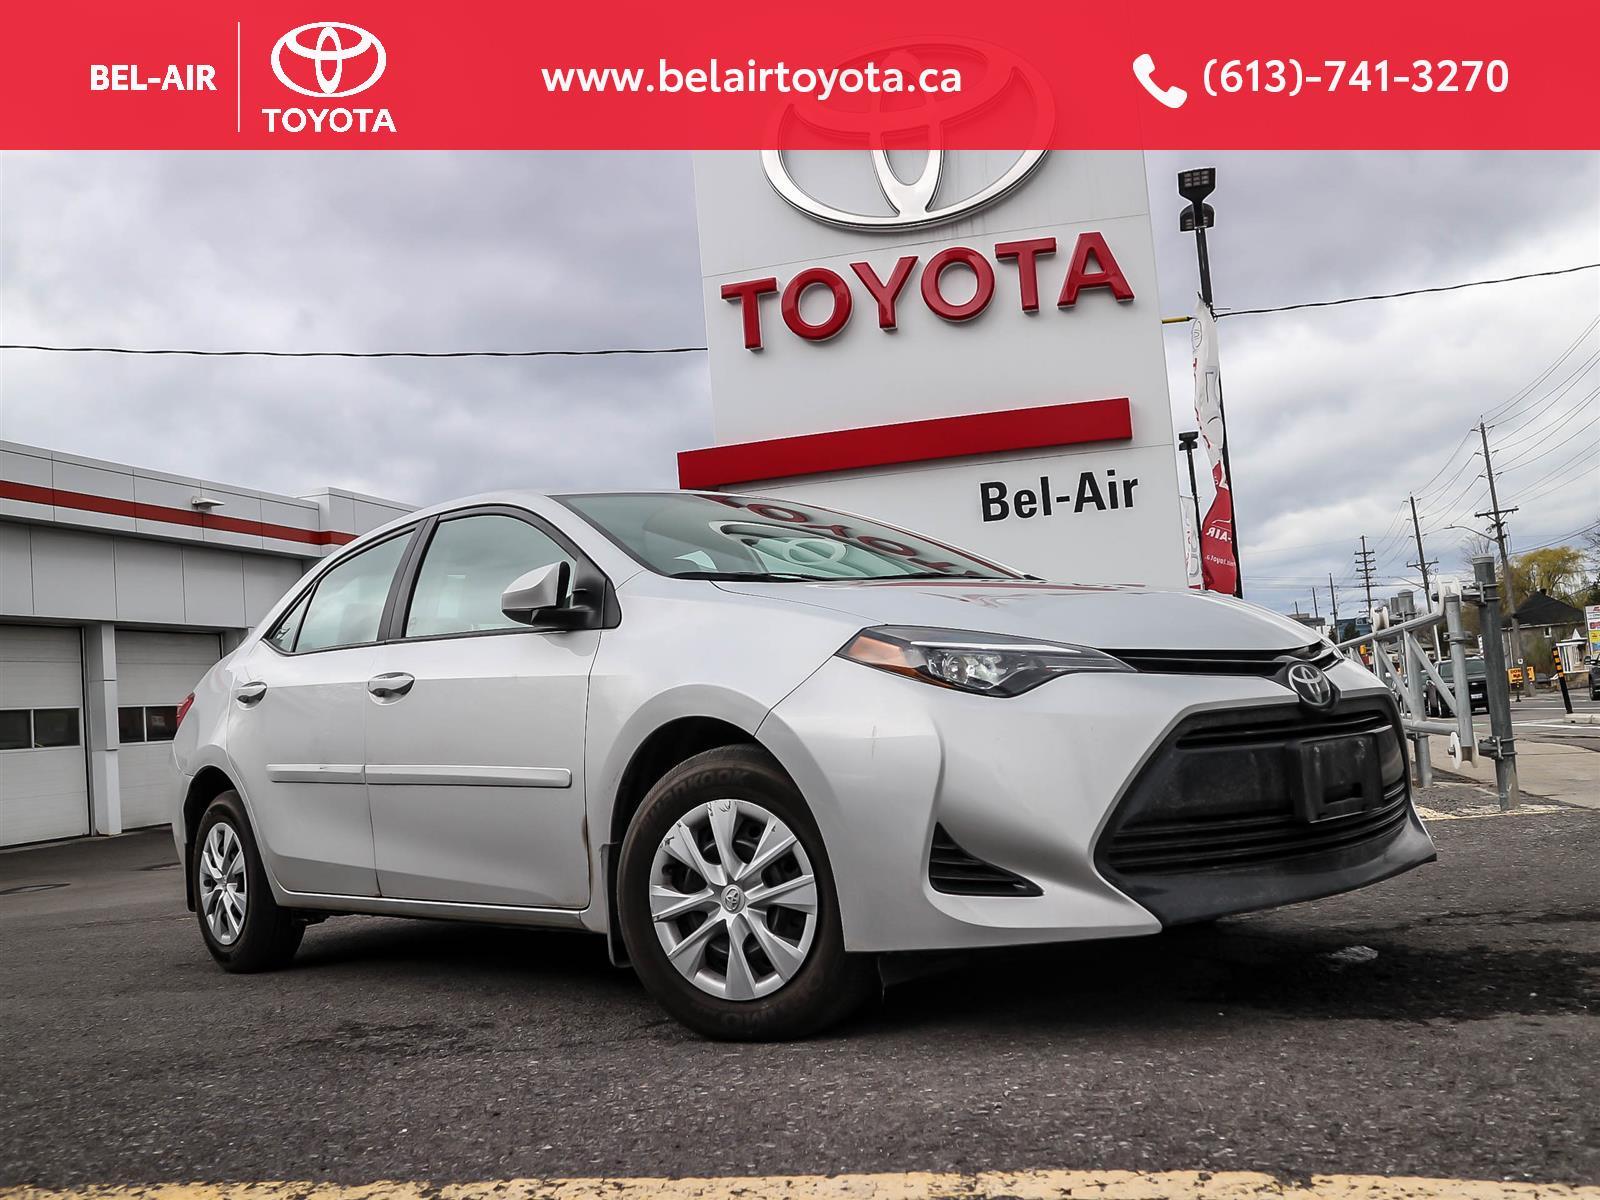 2018 Toyota Corolla CE-0